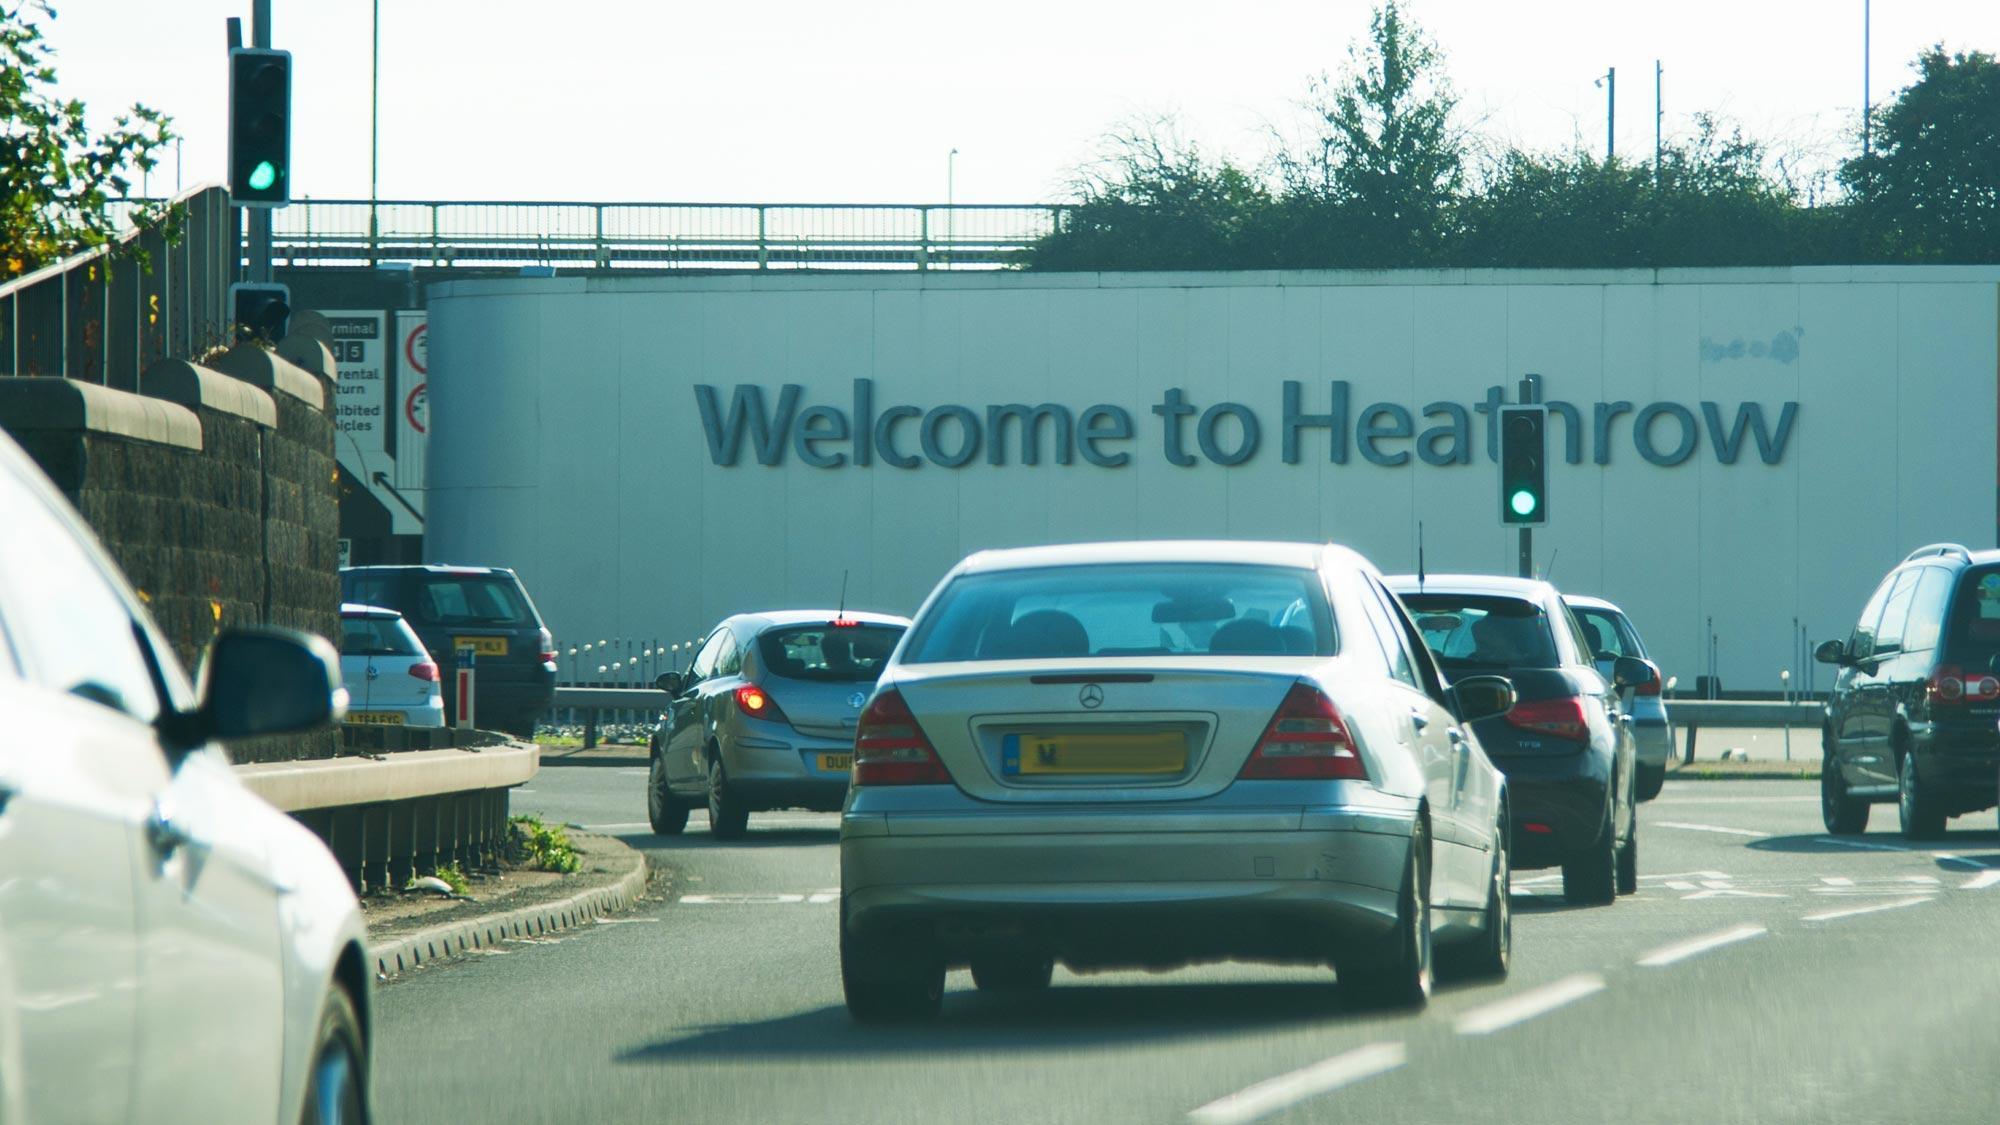 Valet Parking Heathrow Terminal 1 Heathrow Parking I Love